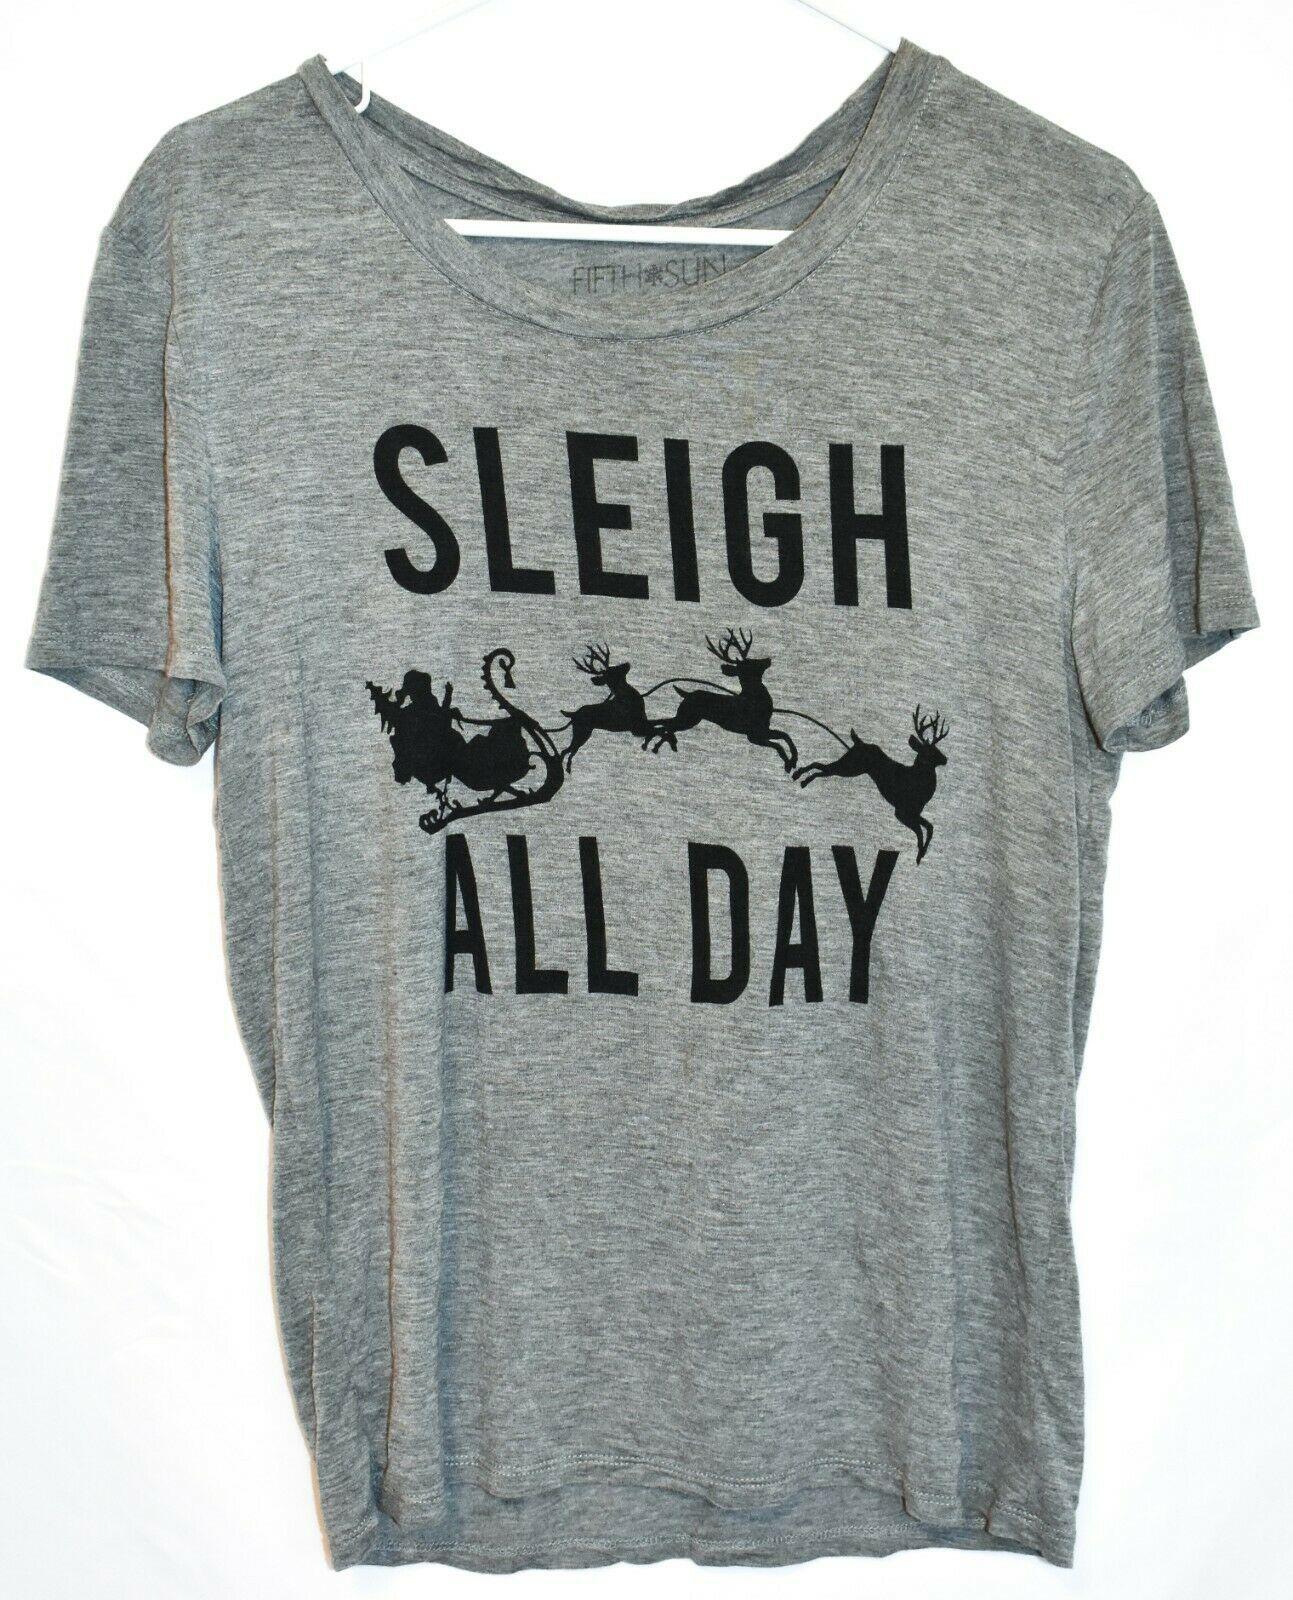 "Fifth Sun Women's ""Sleigh All Day"" Gray Crew Neck T-Shirt Size XS"